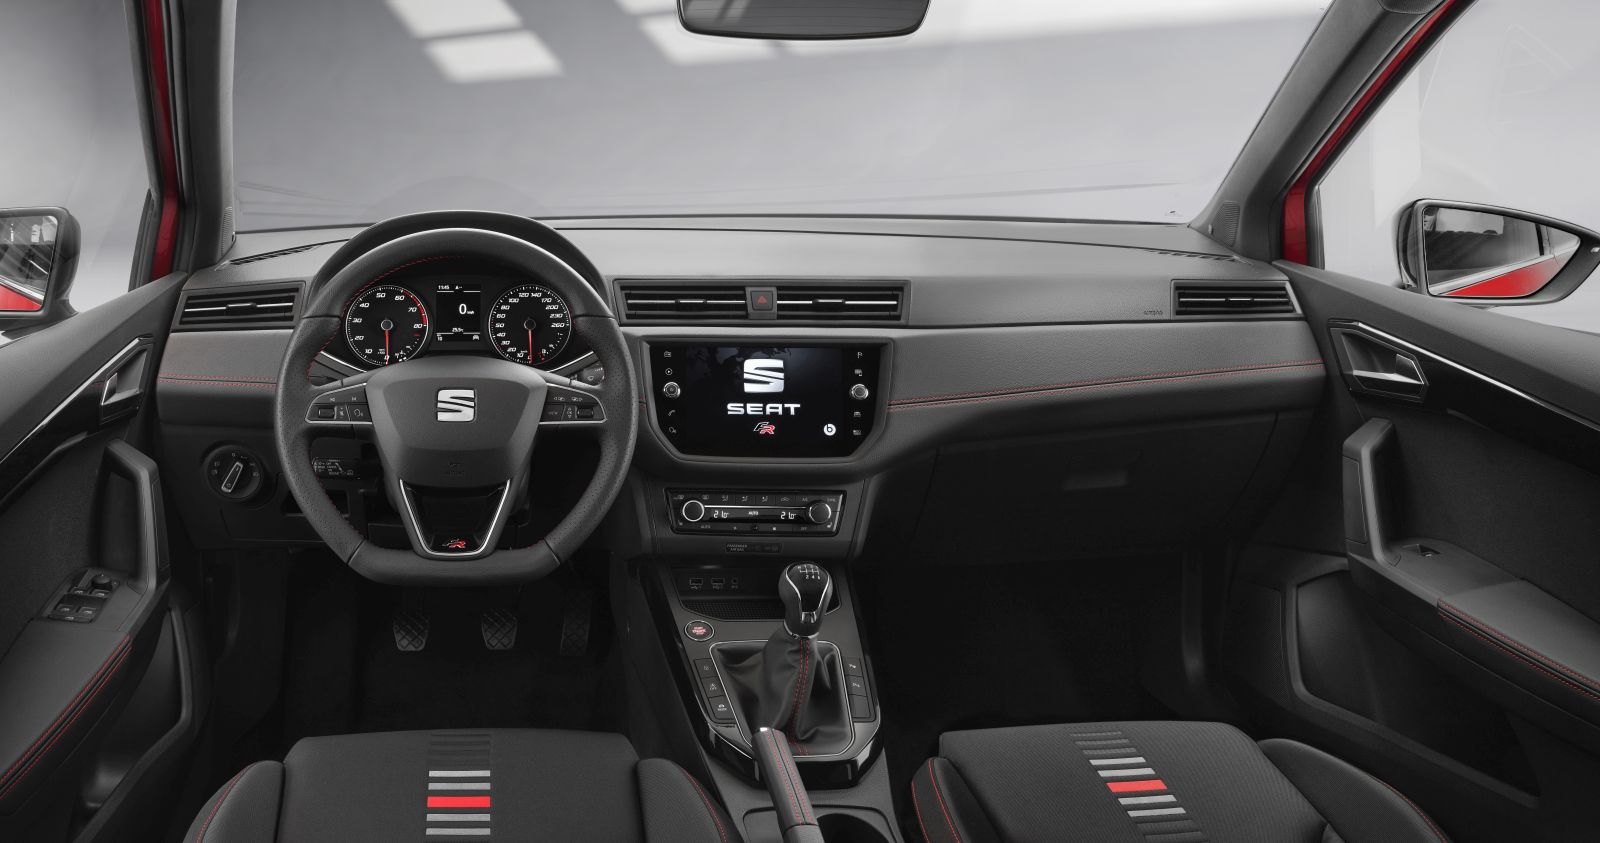 seat-arona-interieur-2017-autobedrijf-jankok